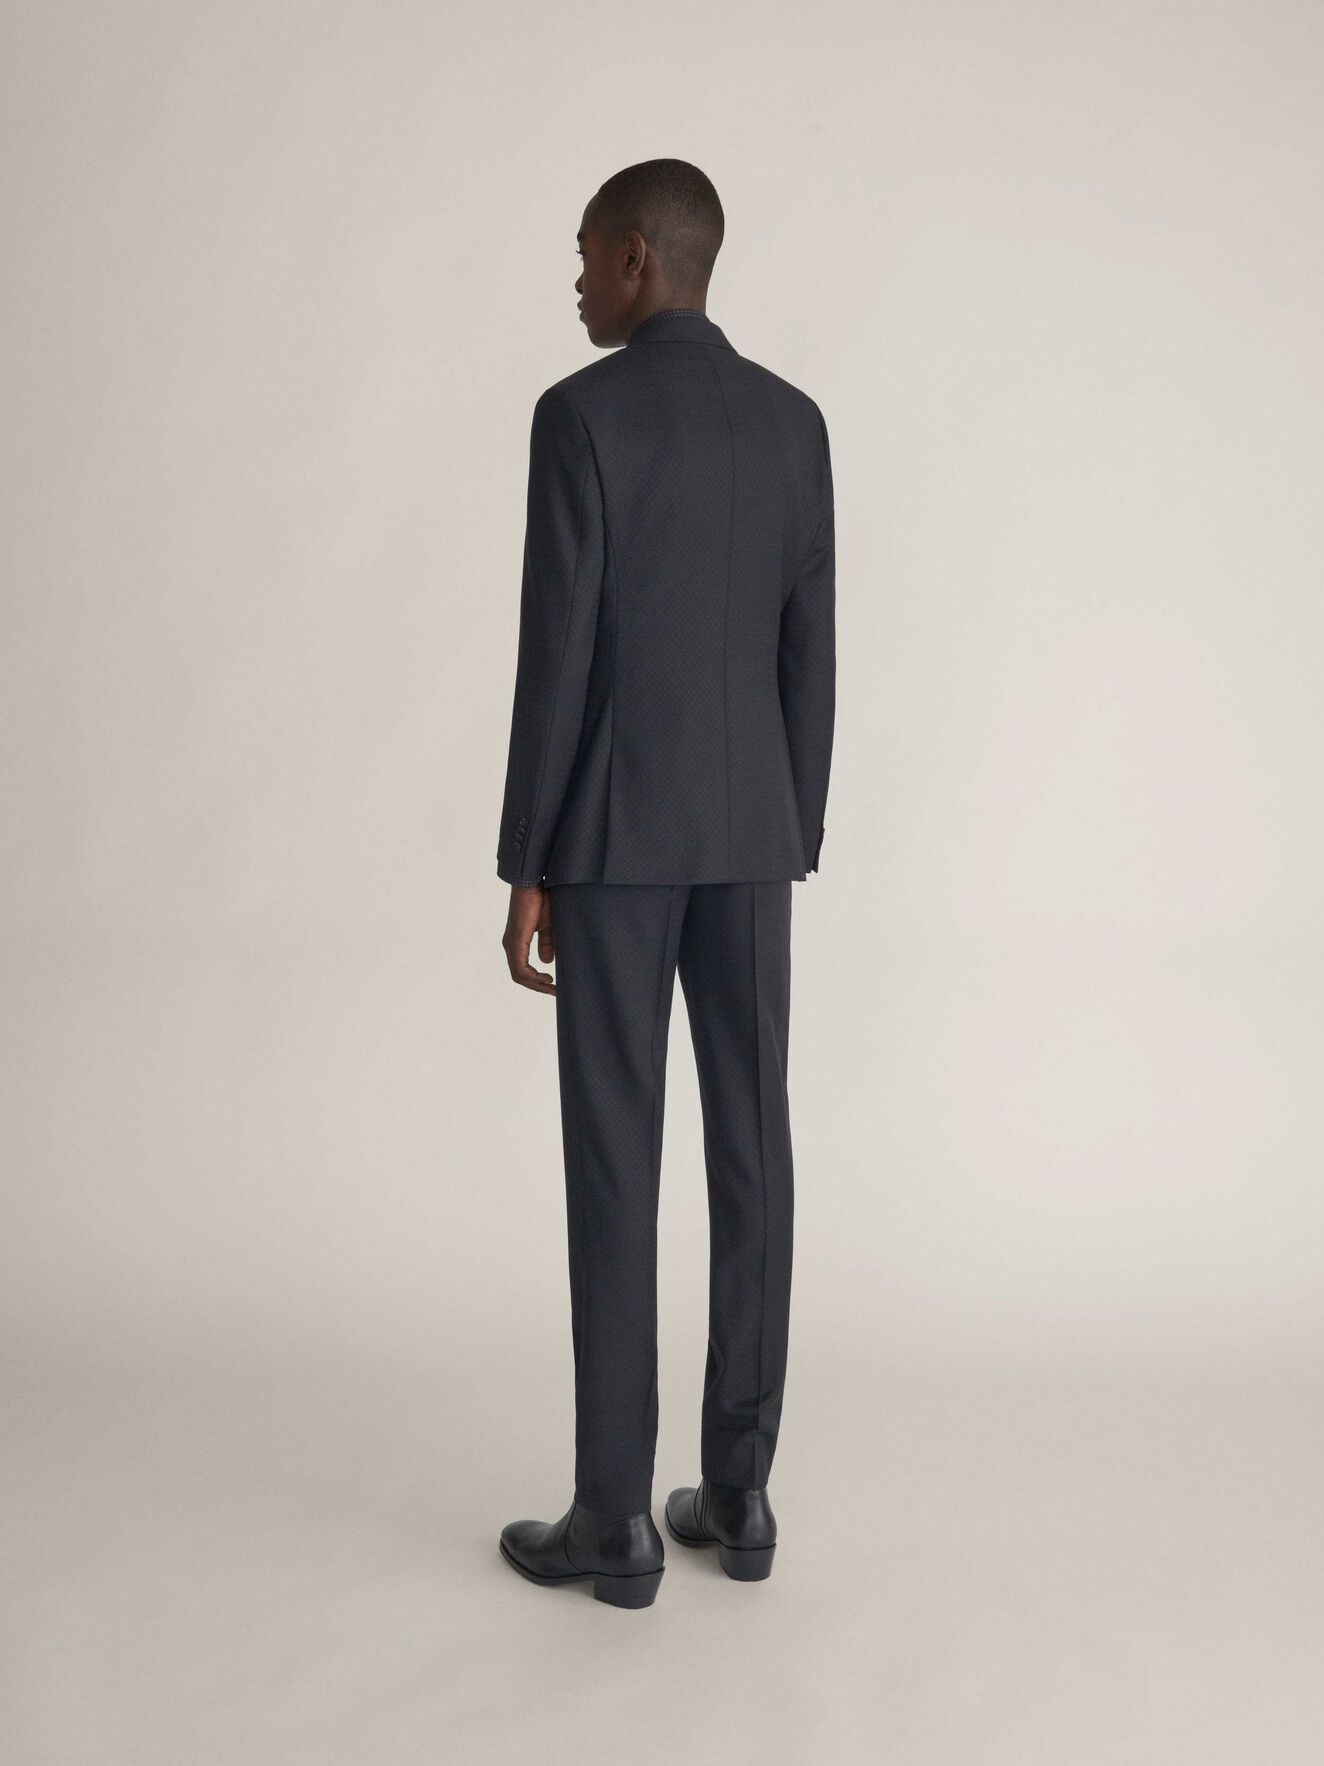 2018 Blazer in Black from Tiger of Sweden